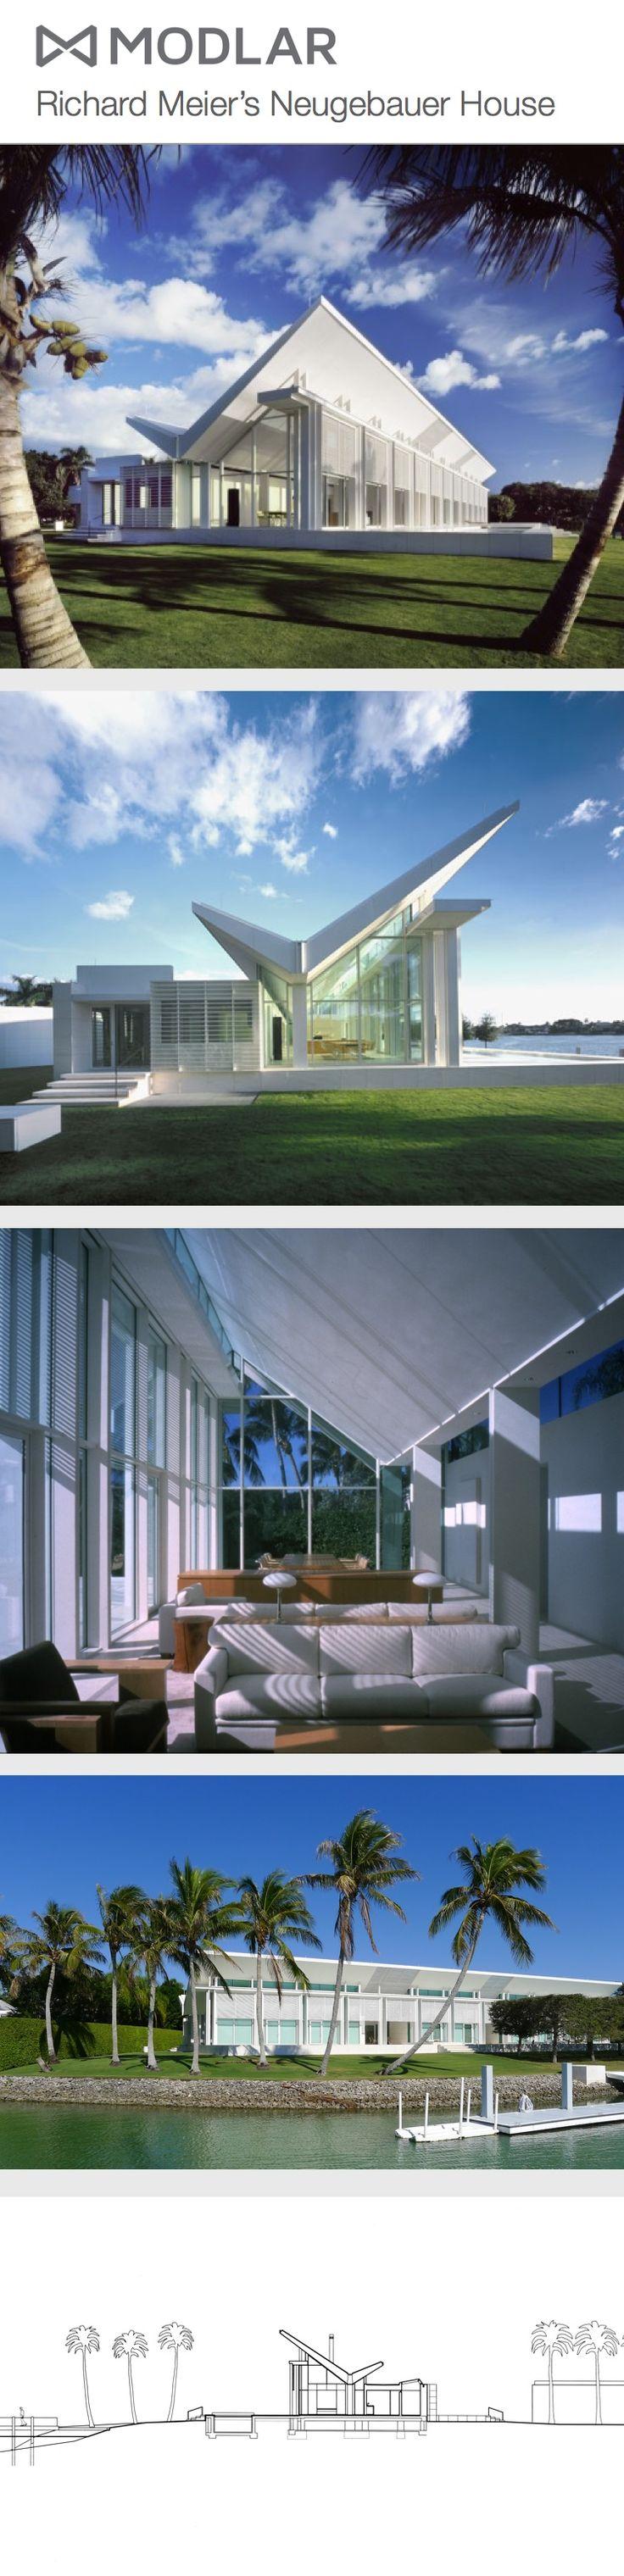 Richard Meier's Neugebauer House #Meier #Architecture modlar.com